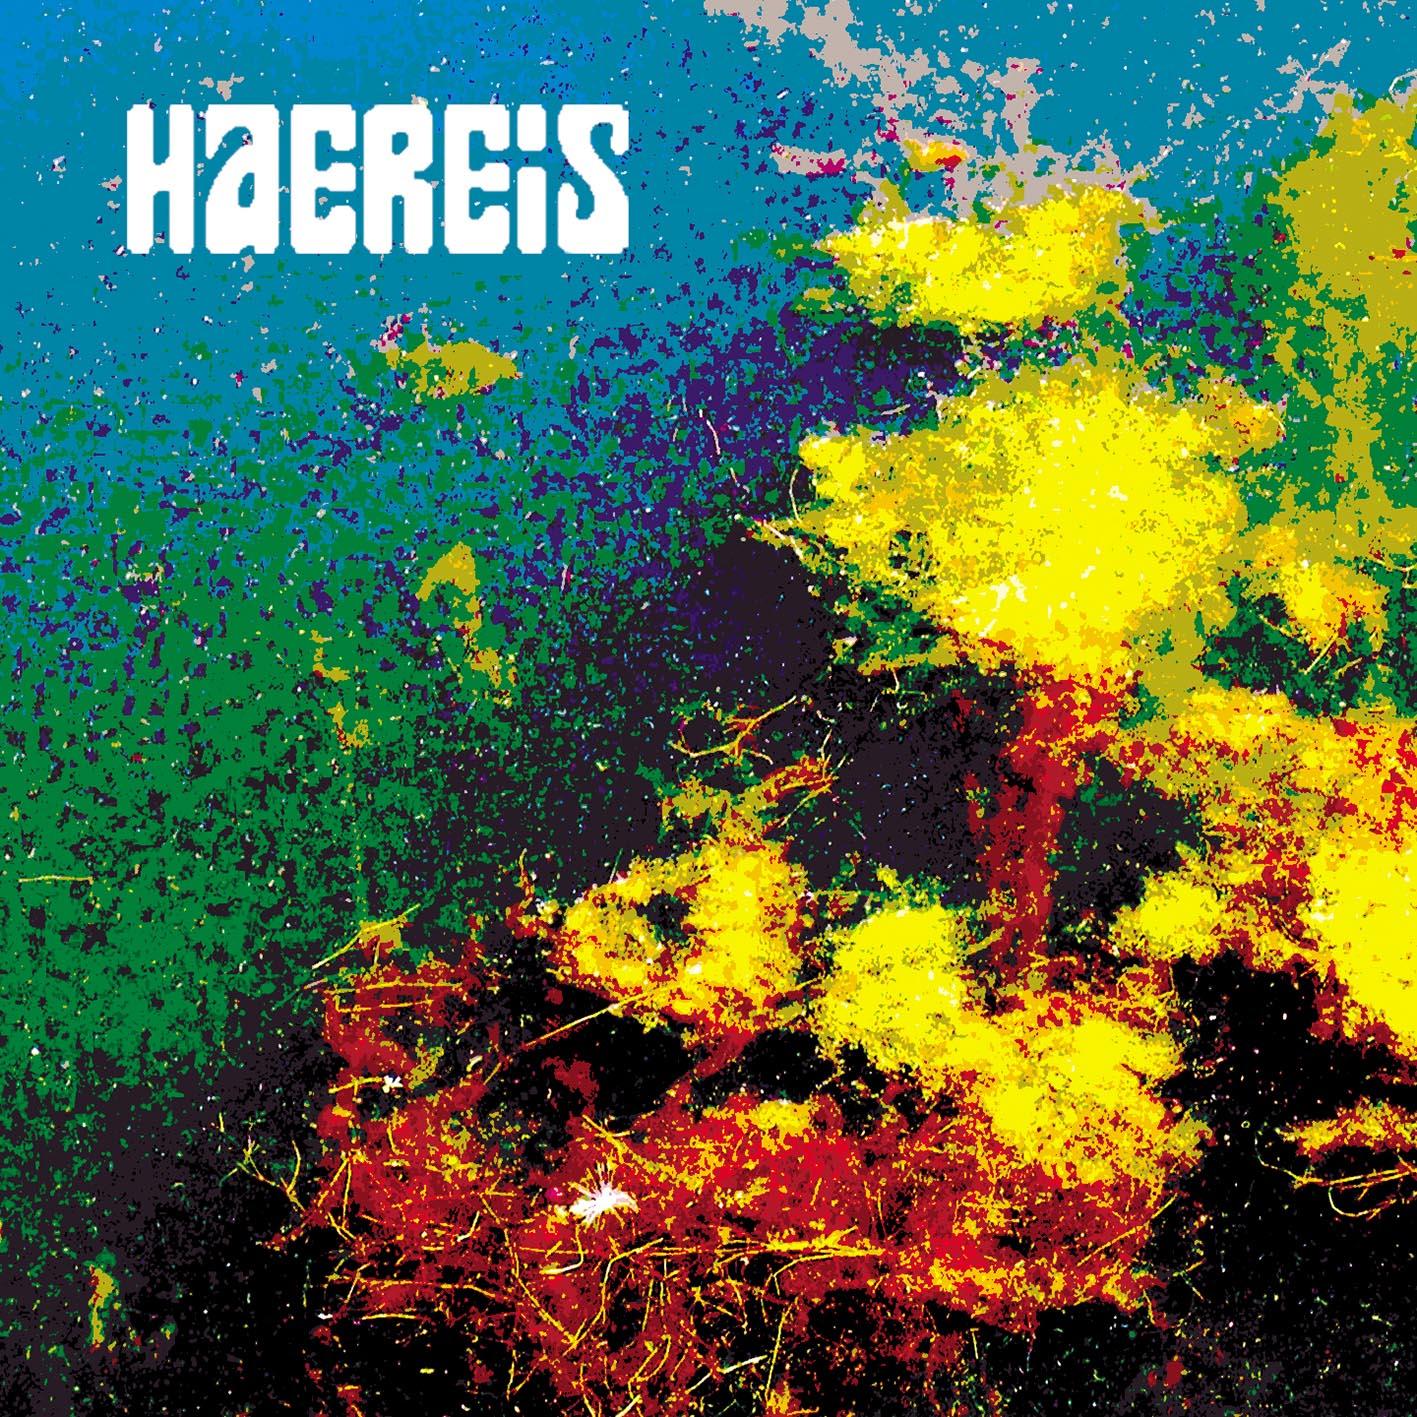 Haereis - cover